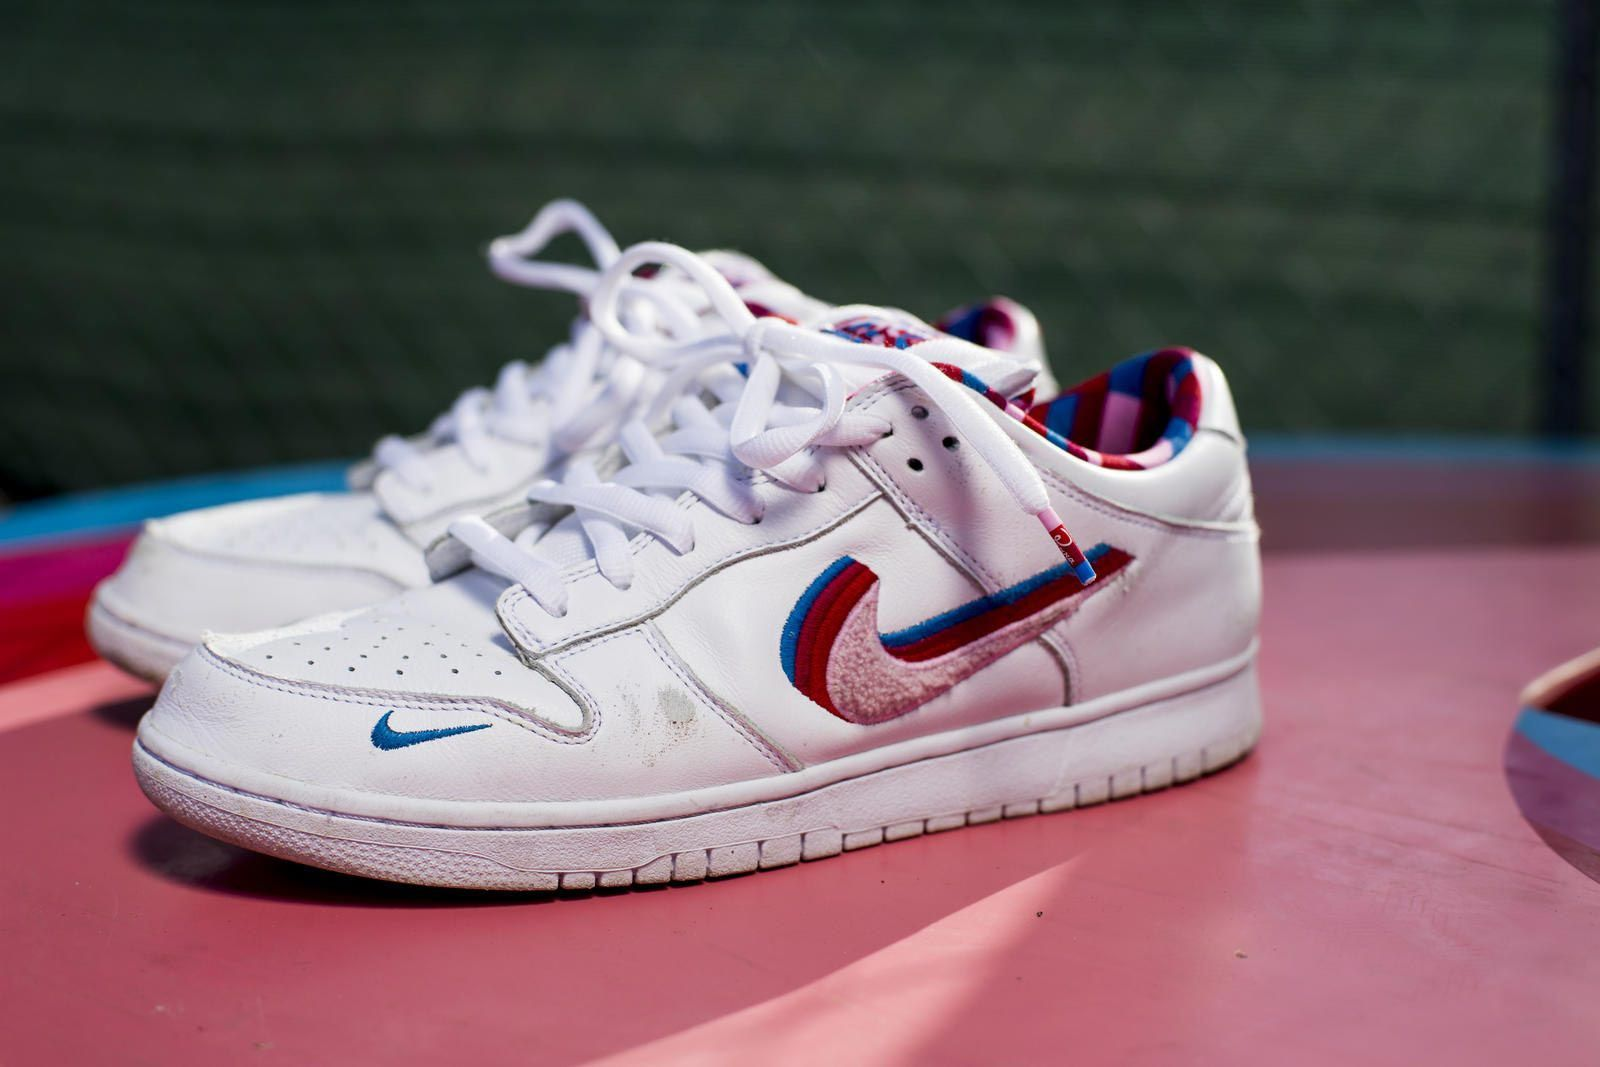 Parra Nike Sb Dunk Low Skated Pair